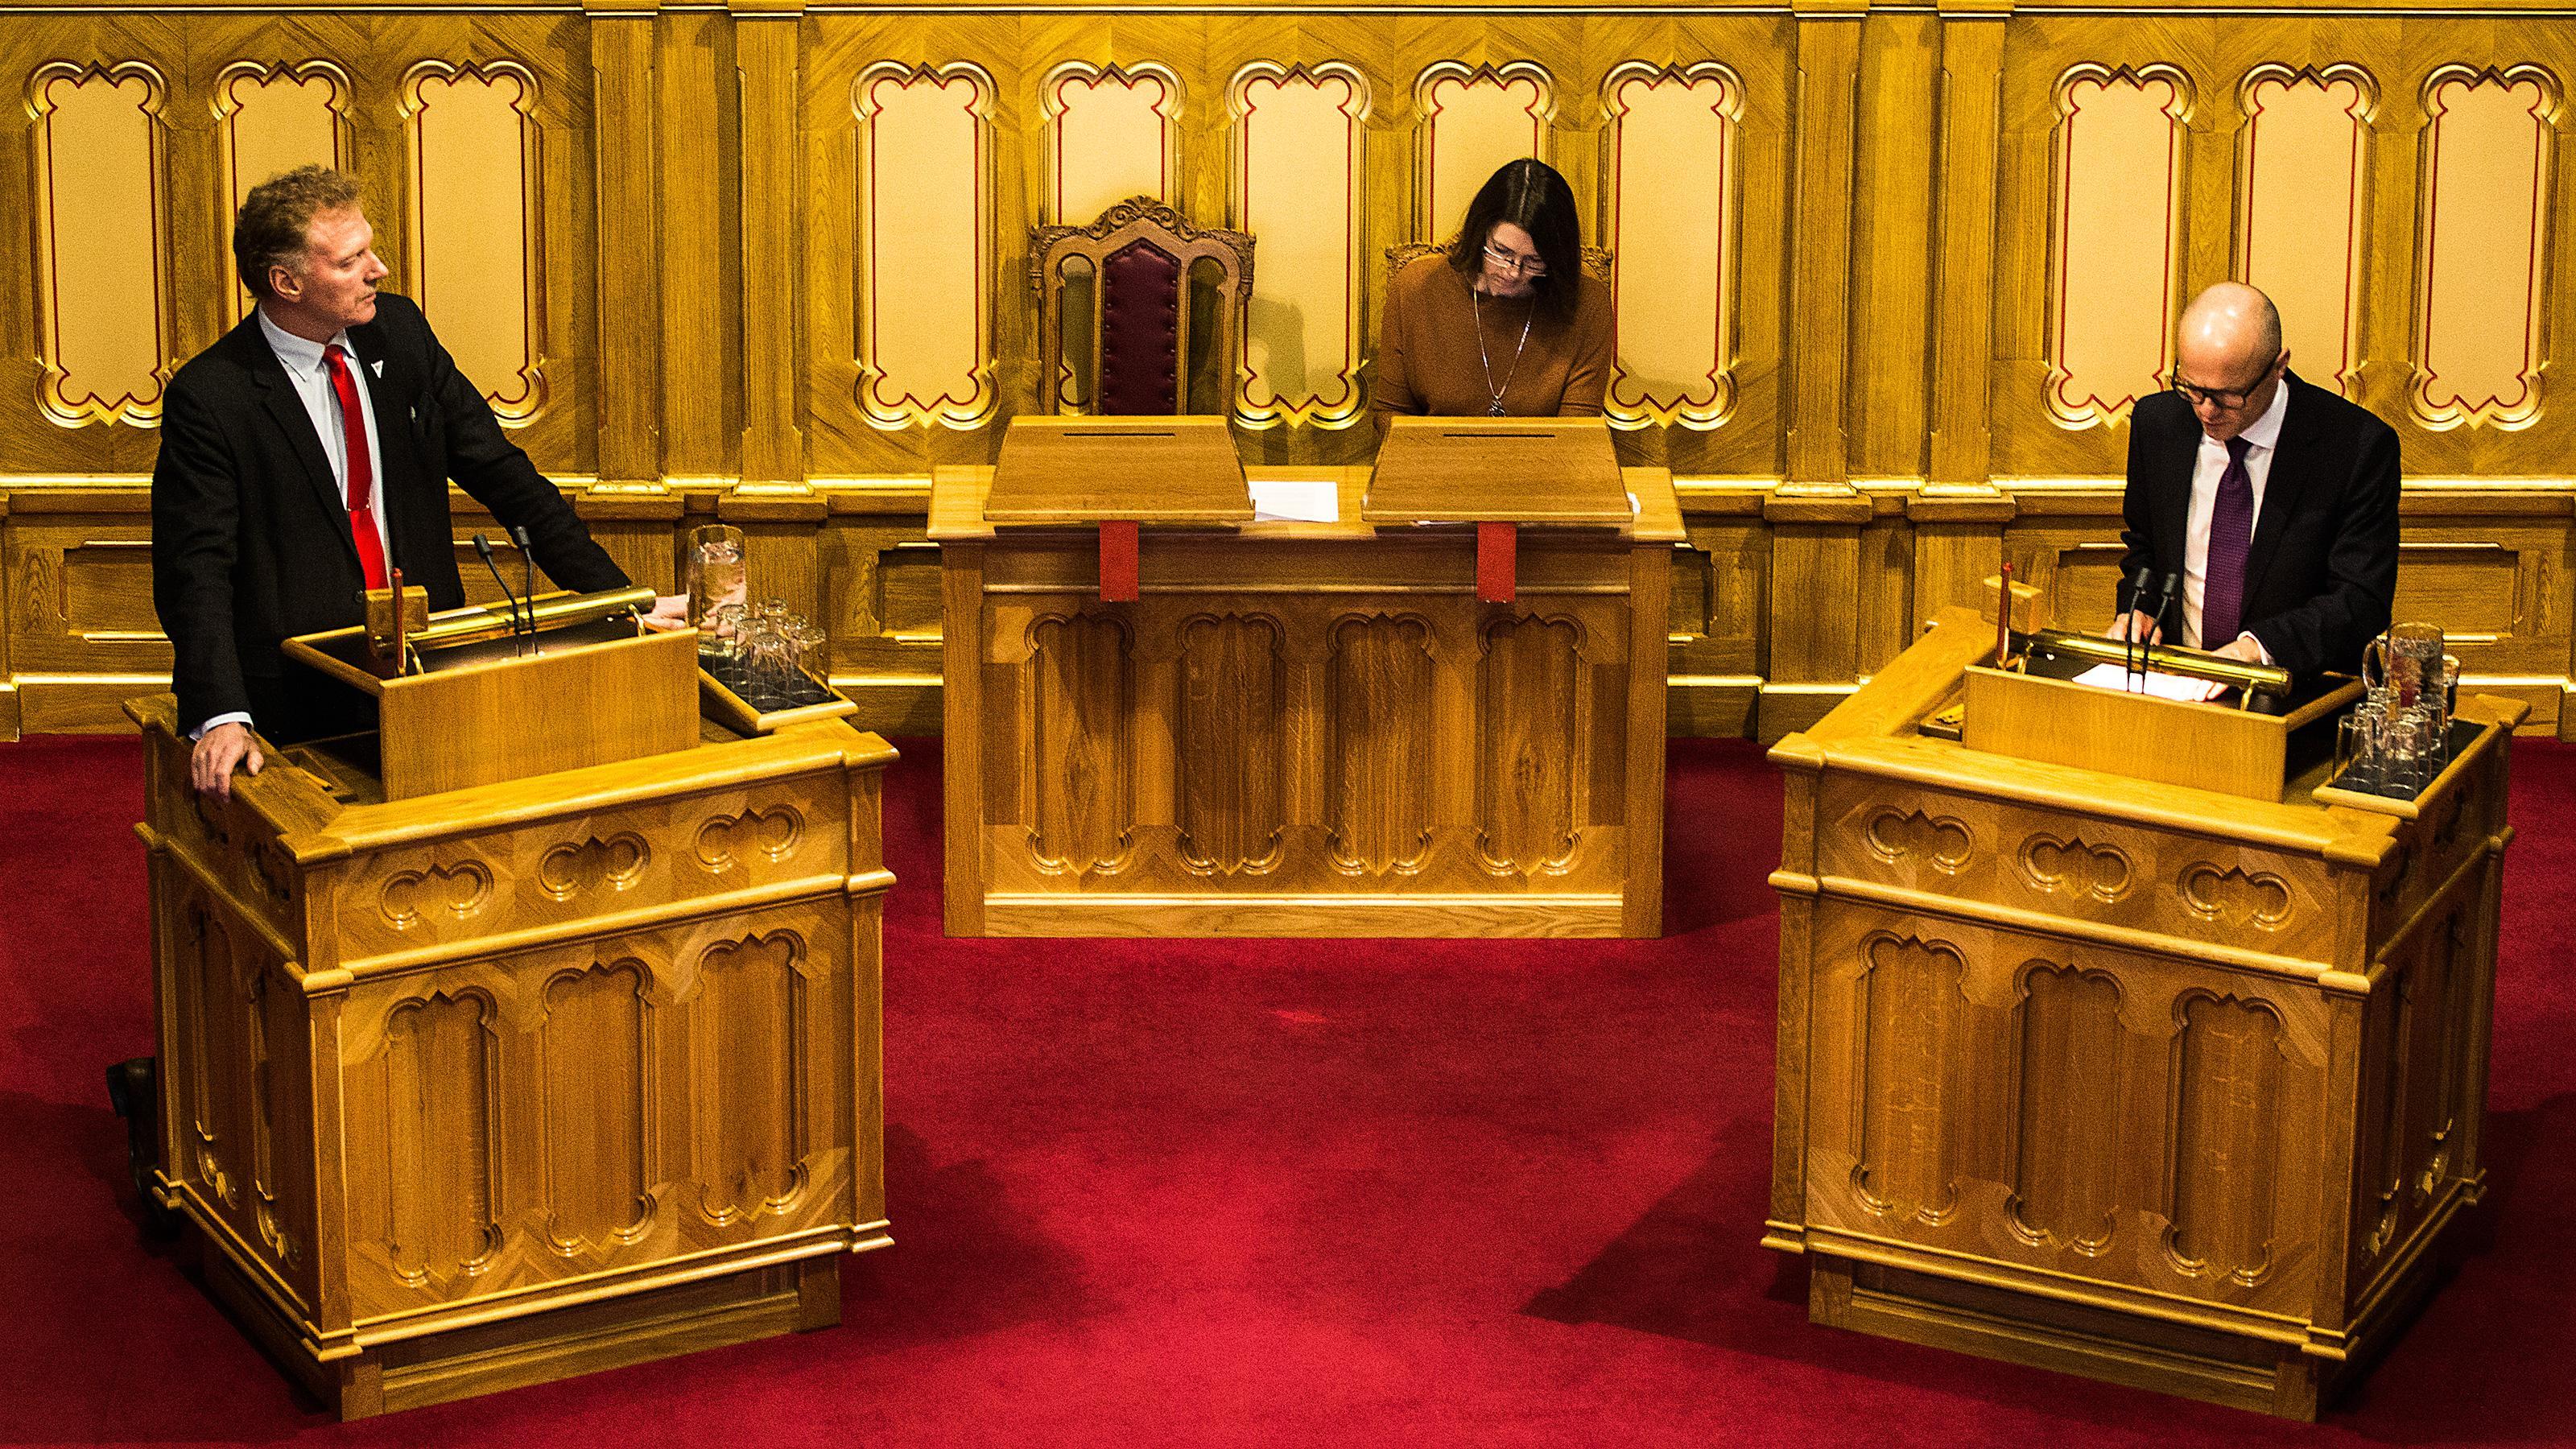 Johnny Ingebrigtsen, Sosialistisk Venstreparti, ber statsråd ved Statsministerens kontor Vidar Helgesen om en redegjøring.Foto: Varg Aamo, Hardware.no